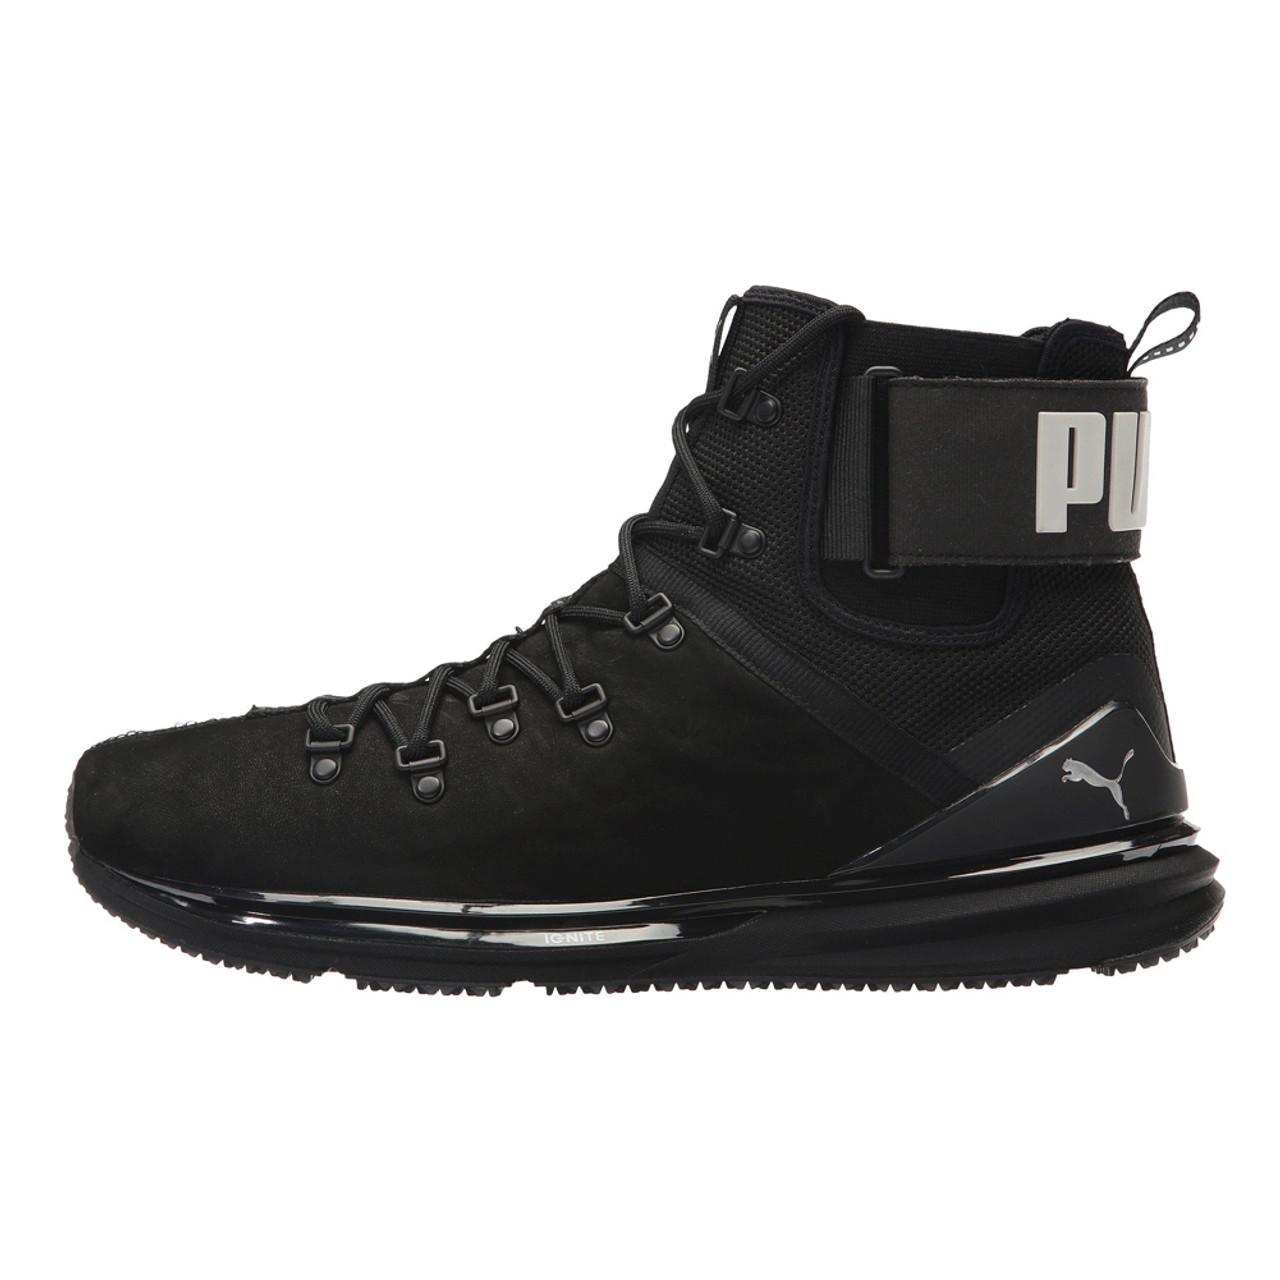 brand new 491b8 8caff Puma Men's Ignite Limitless Boot Leather Puma Black